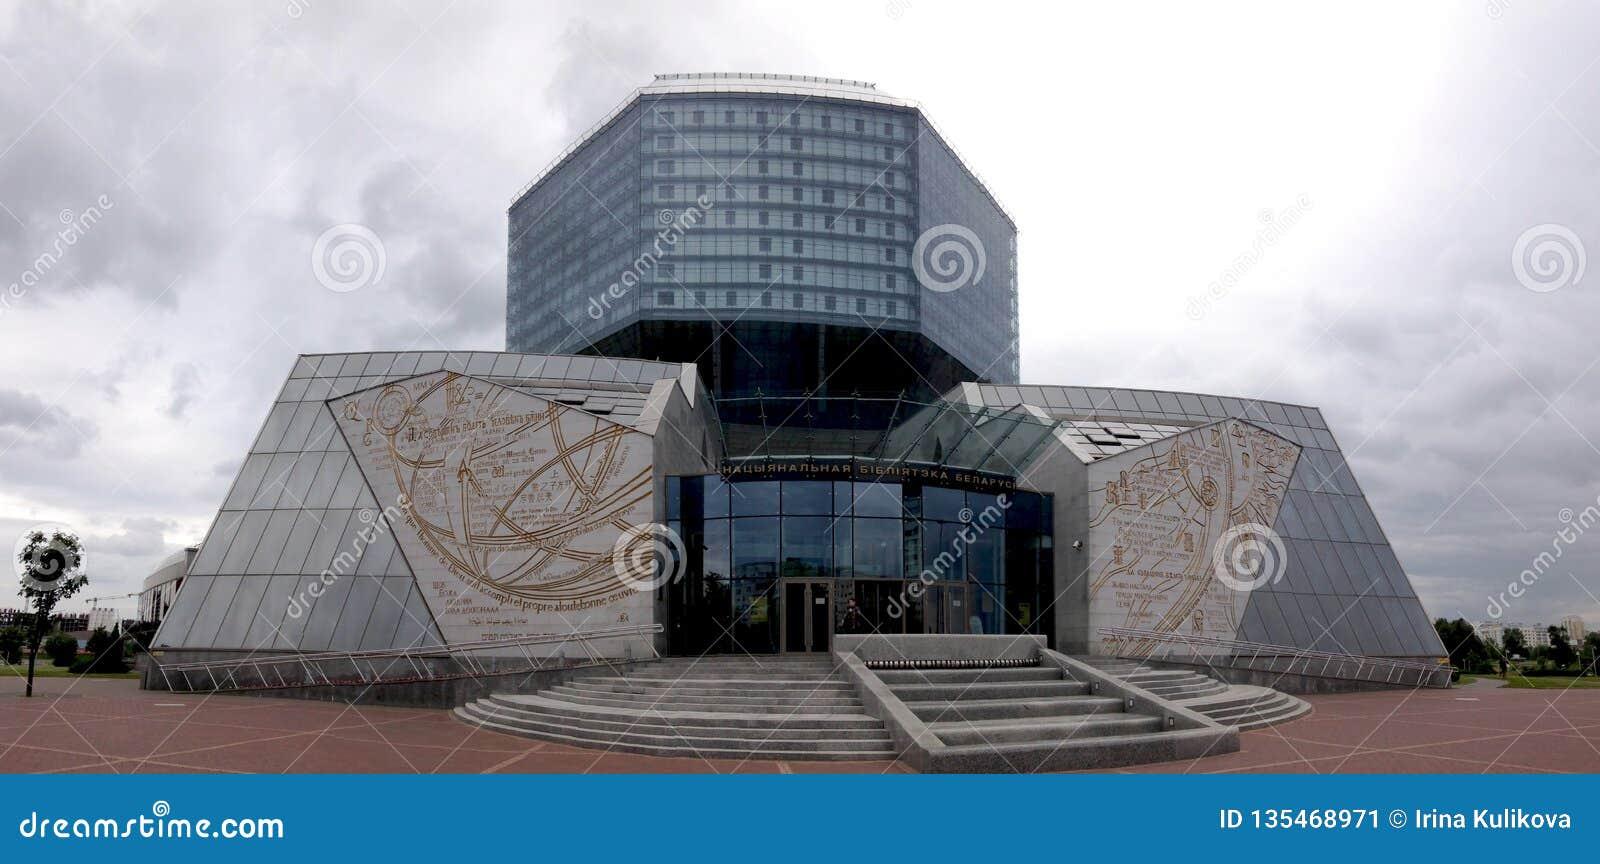 Minsk, Belarus - 12 juin 2014 : Bâtiment moderne de la Bibliothèque nationale du Belarus, Minsk Front View